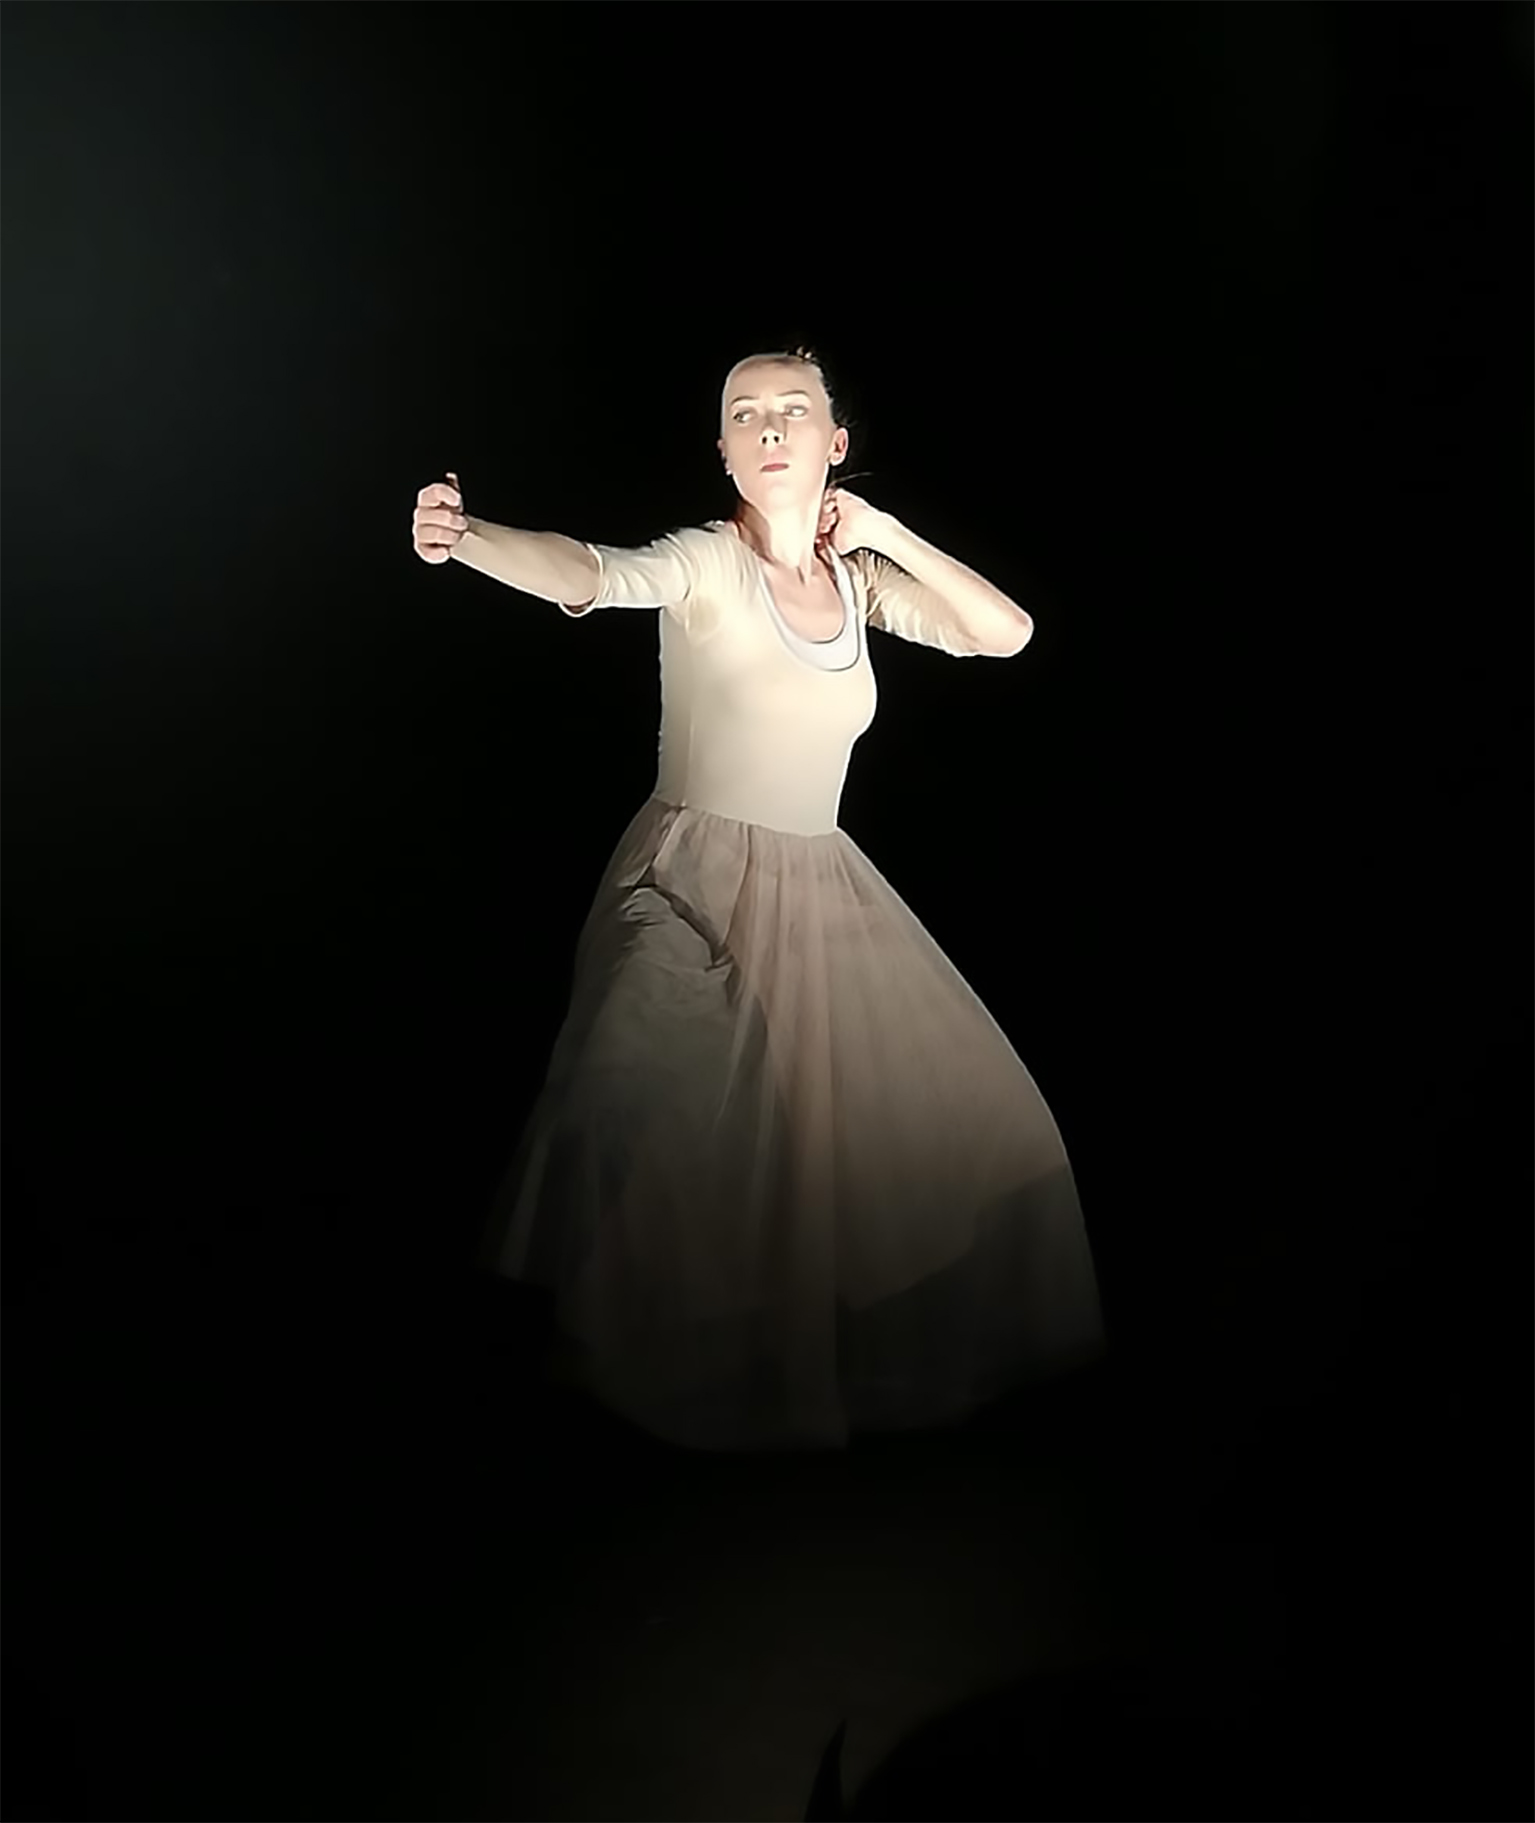 Bailar o Bailar, Por Paco Gomez Nadal